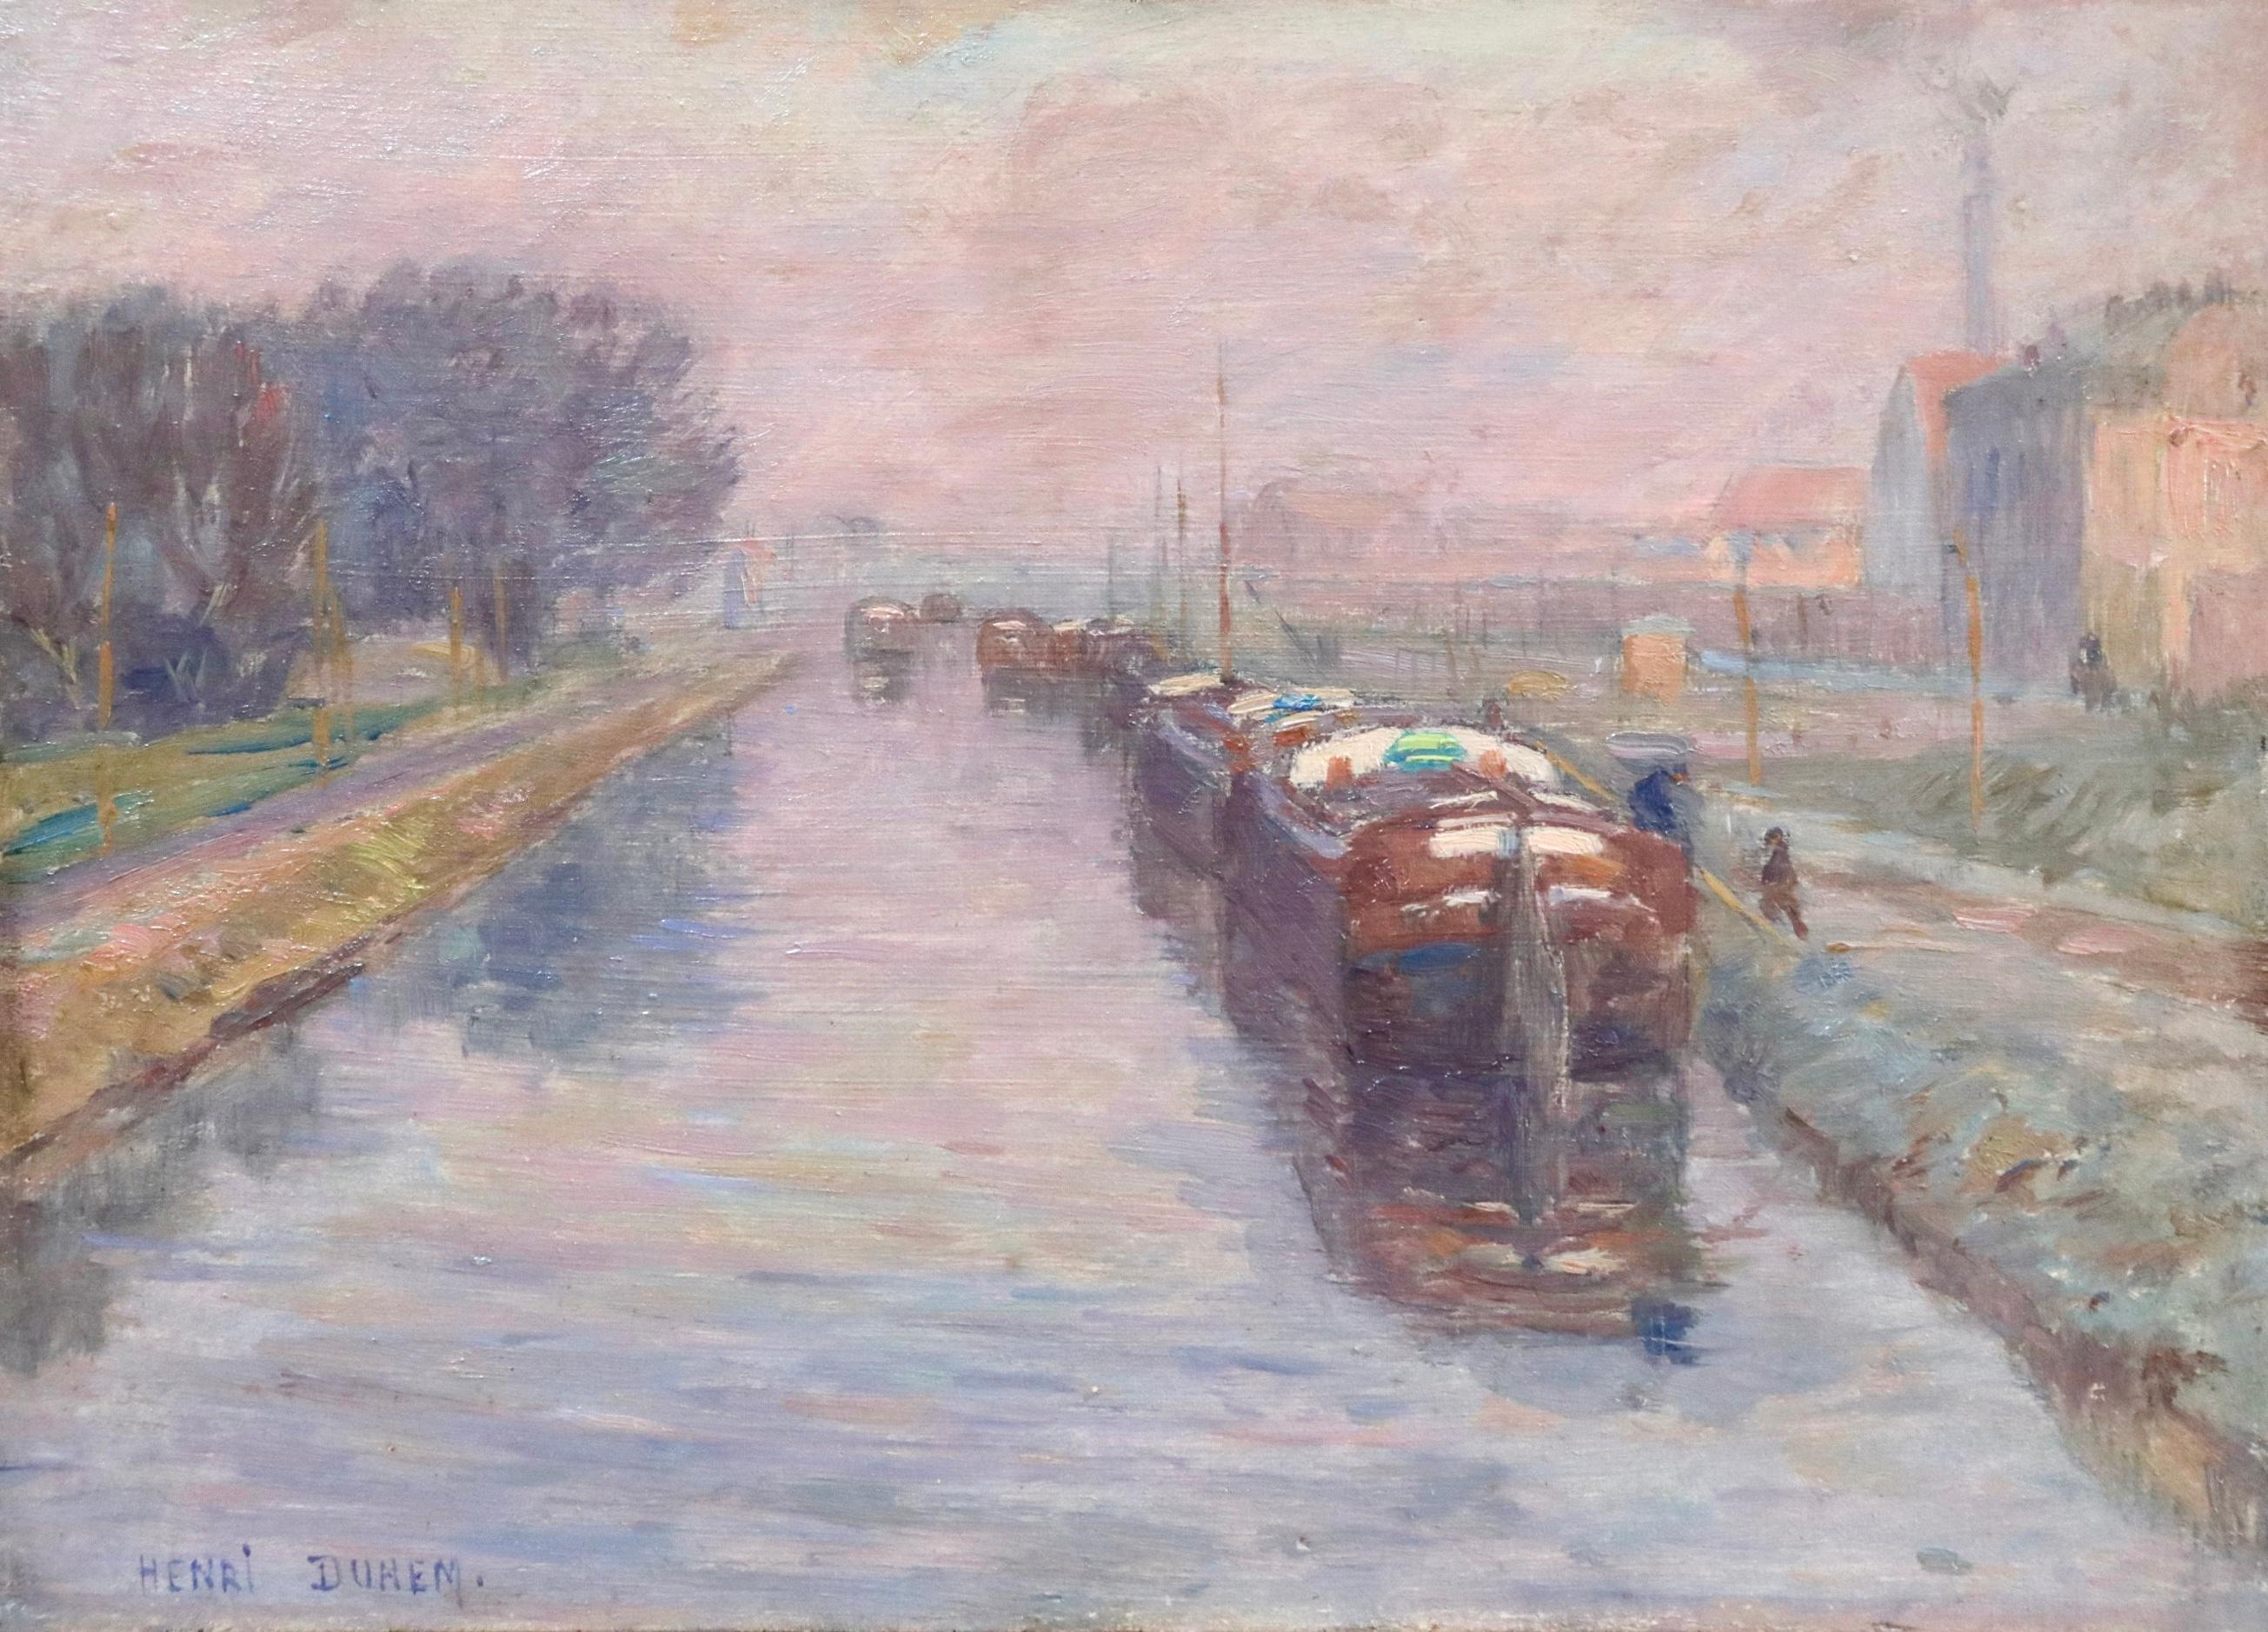 Canal à Douai - Hiver - 19th Century Oil, Barges in Winter Landscape by H Duhem